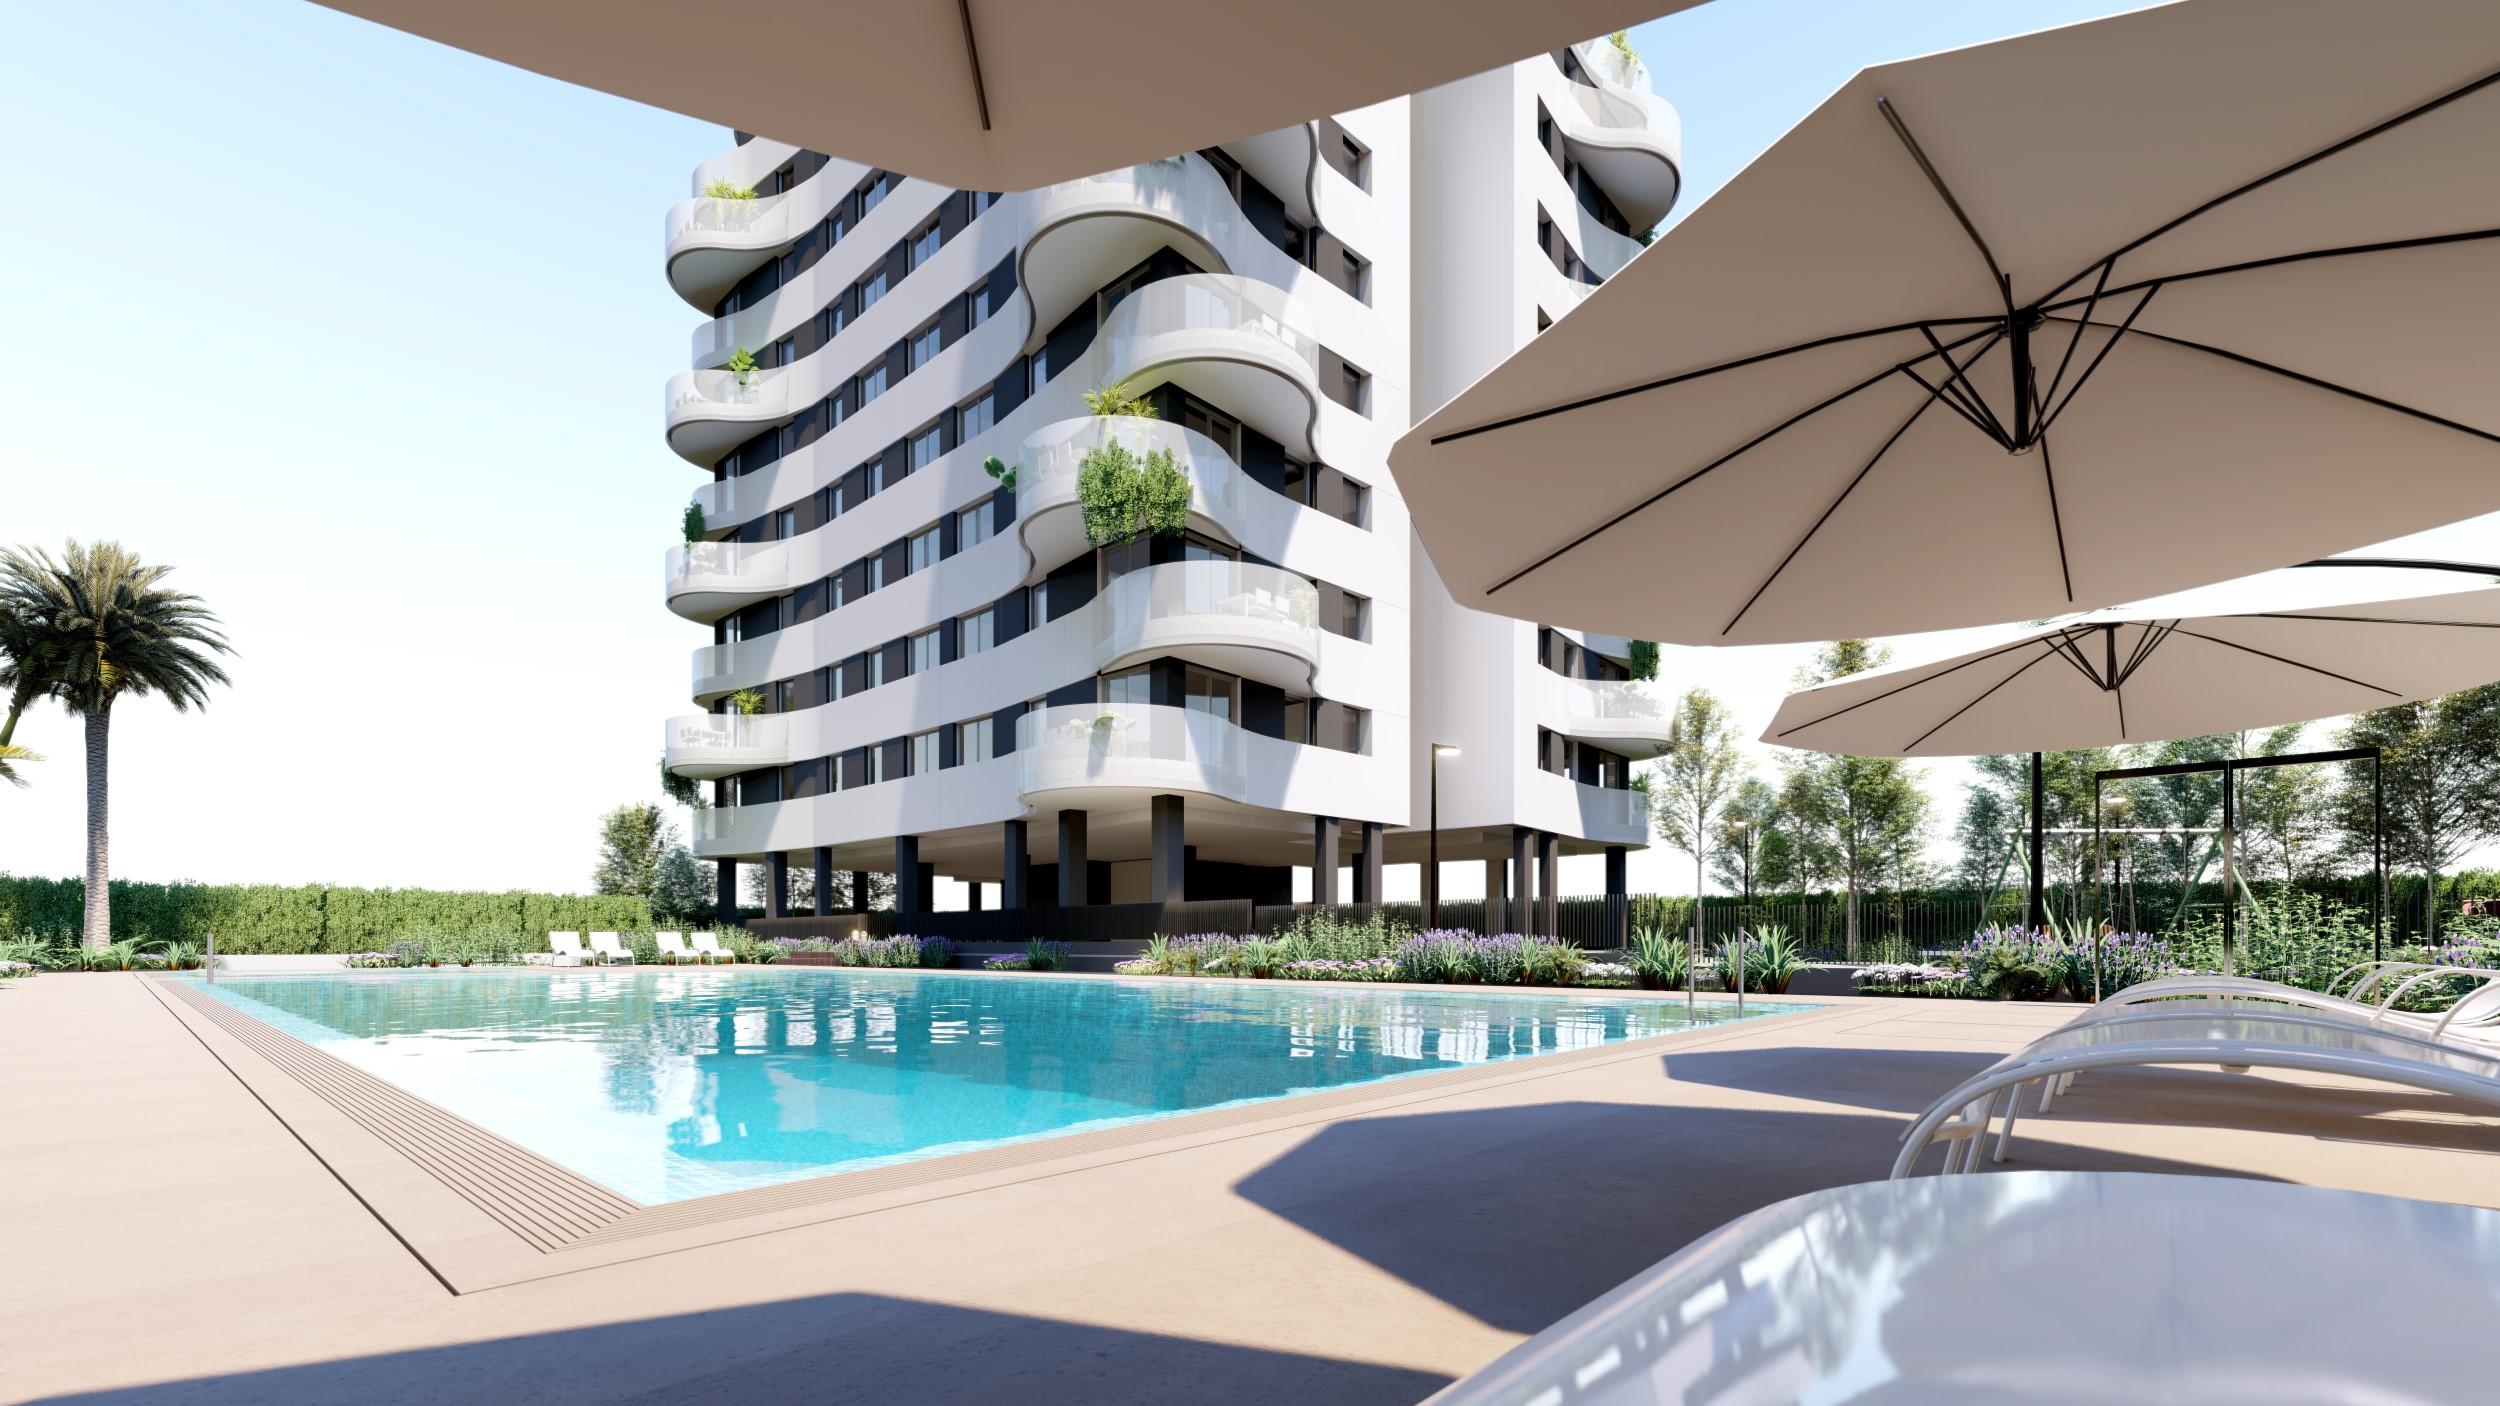 Neinor: pisos en venta en Castellon de la Plana/Castello de la Plana